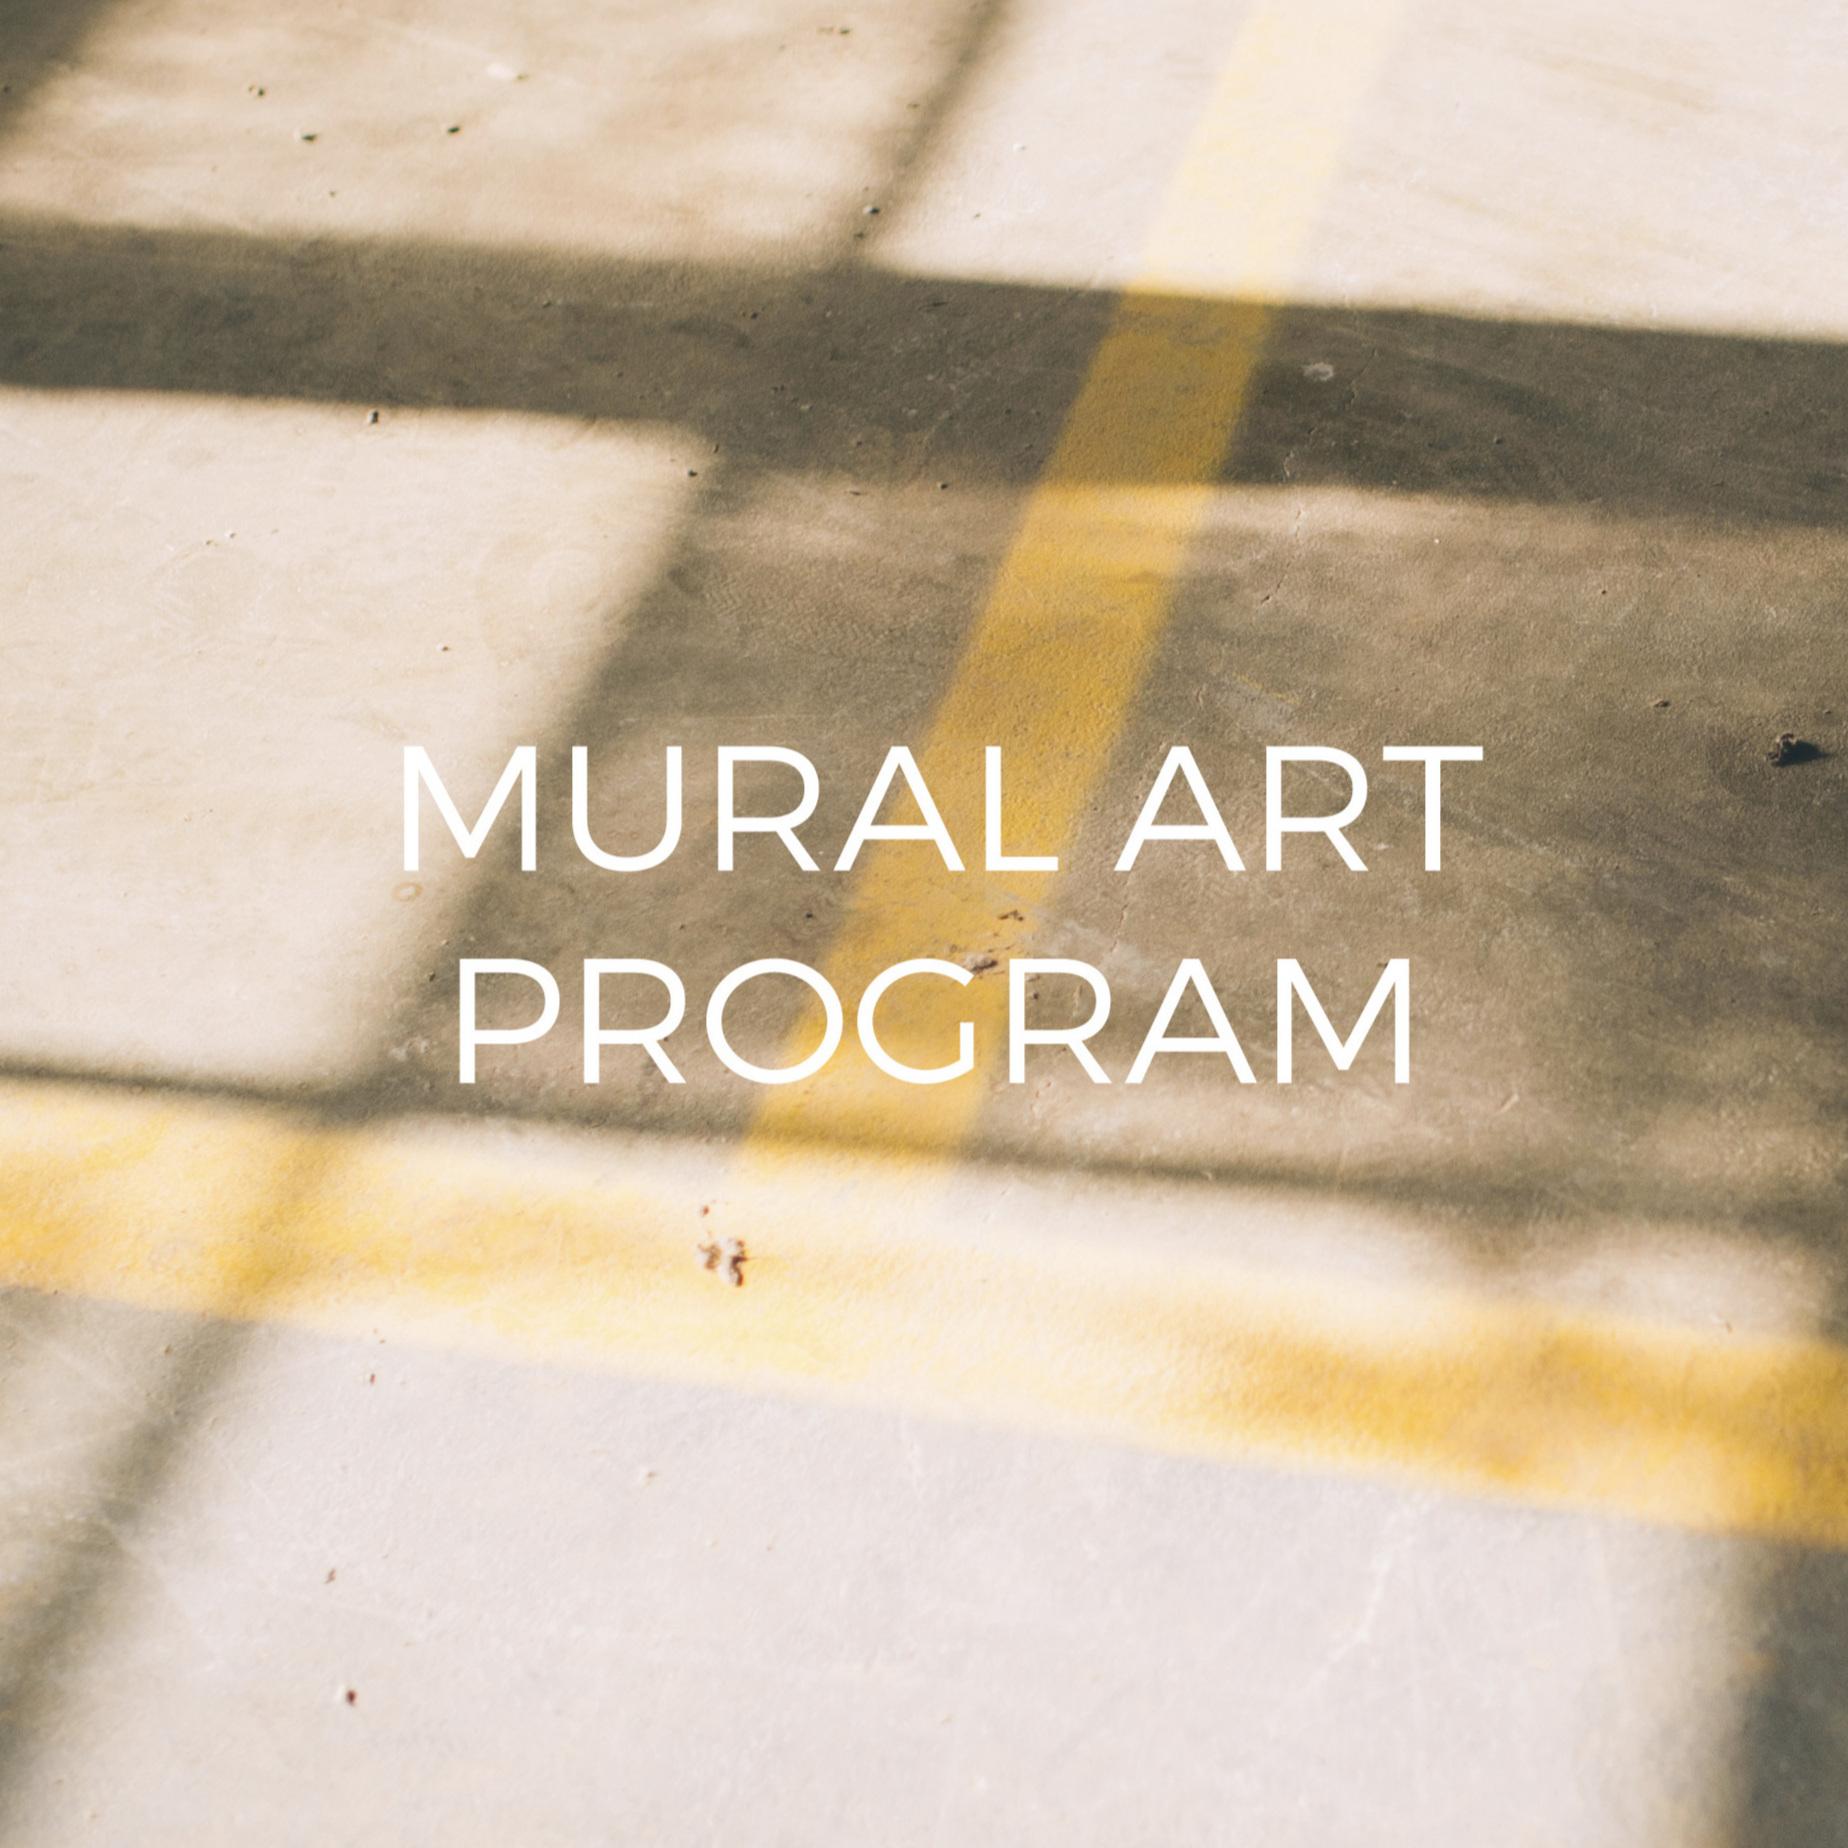 muralARTprogram.jpg